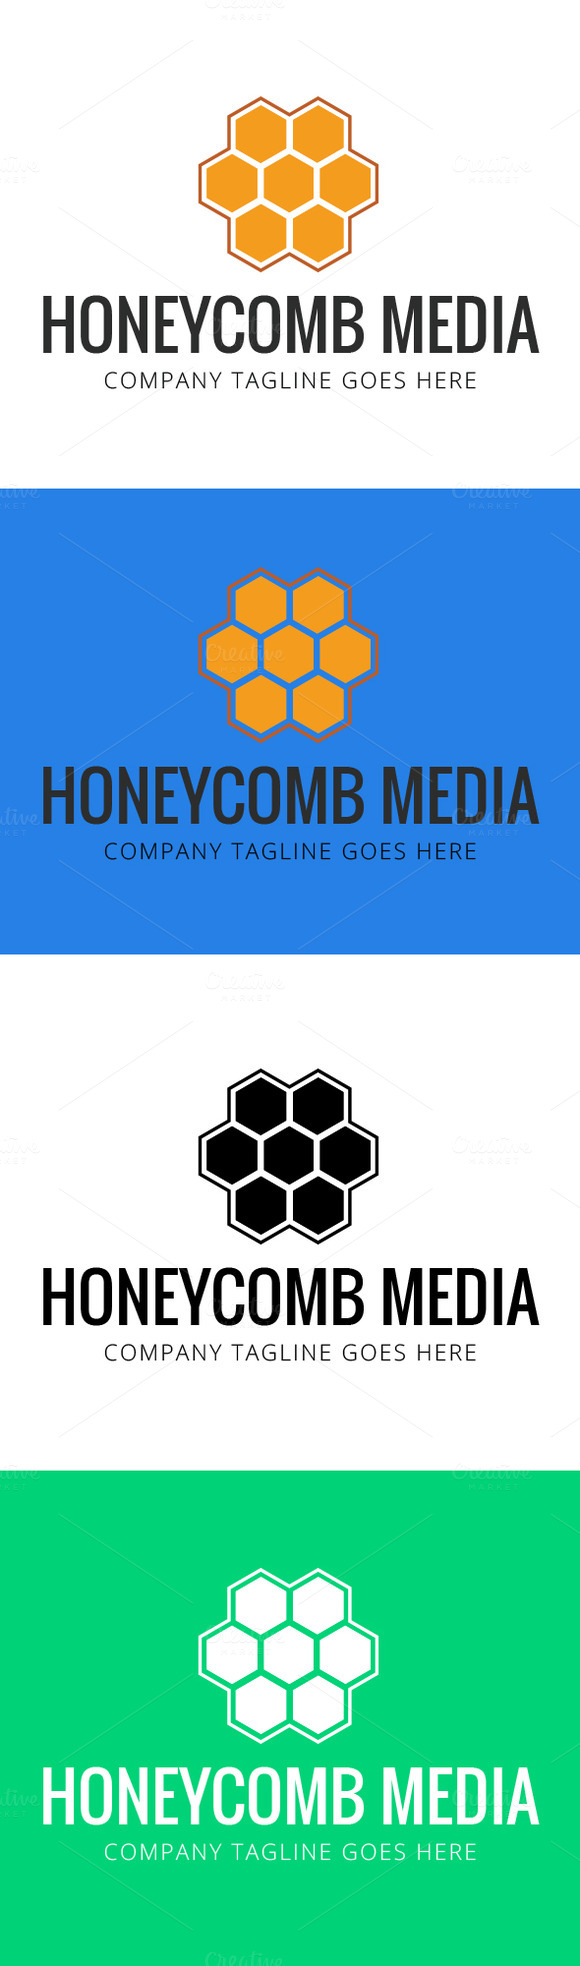 Honeycomb Logo Template